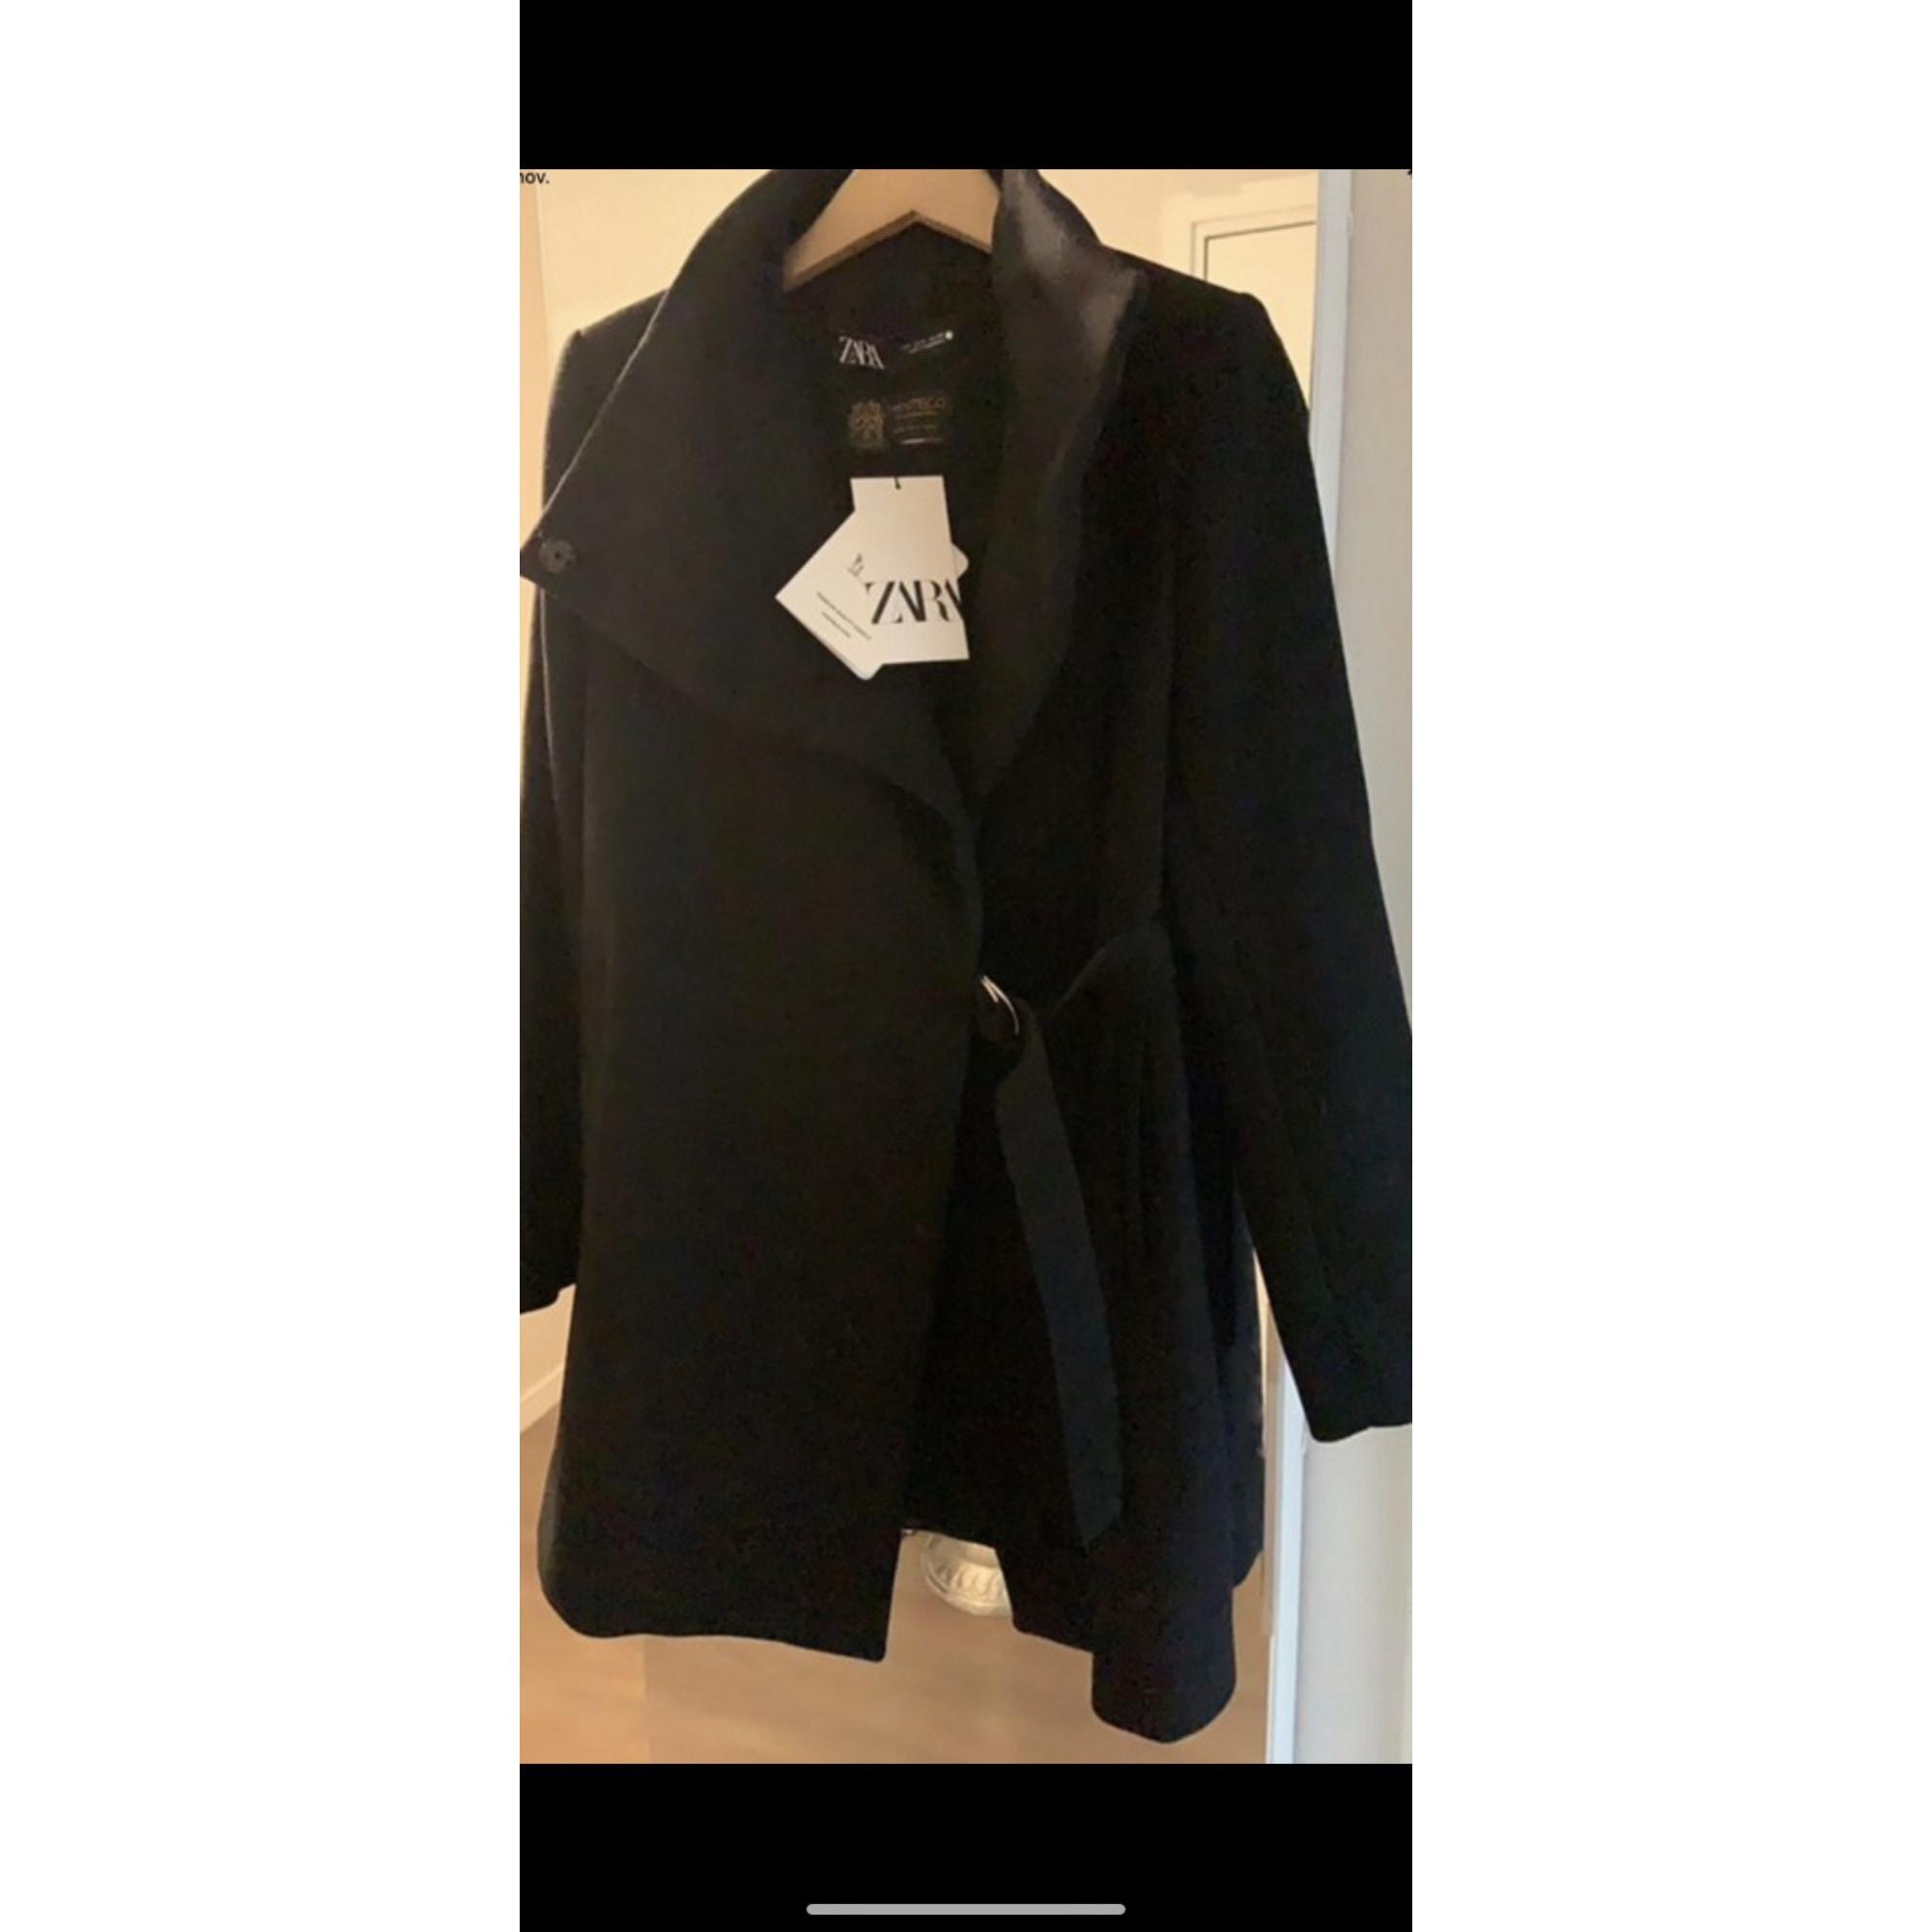 Manteau ZARA 36 (S, T1) noir 9790330